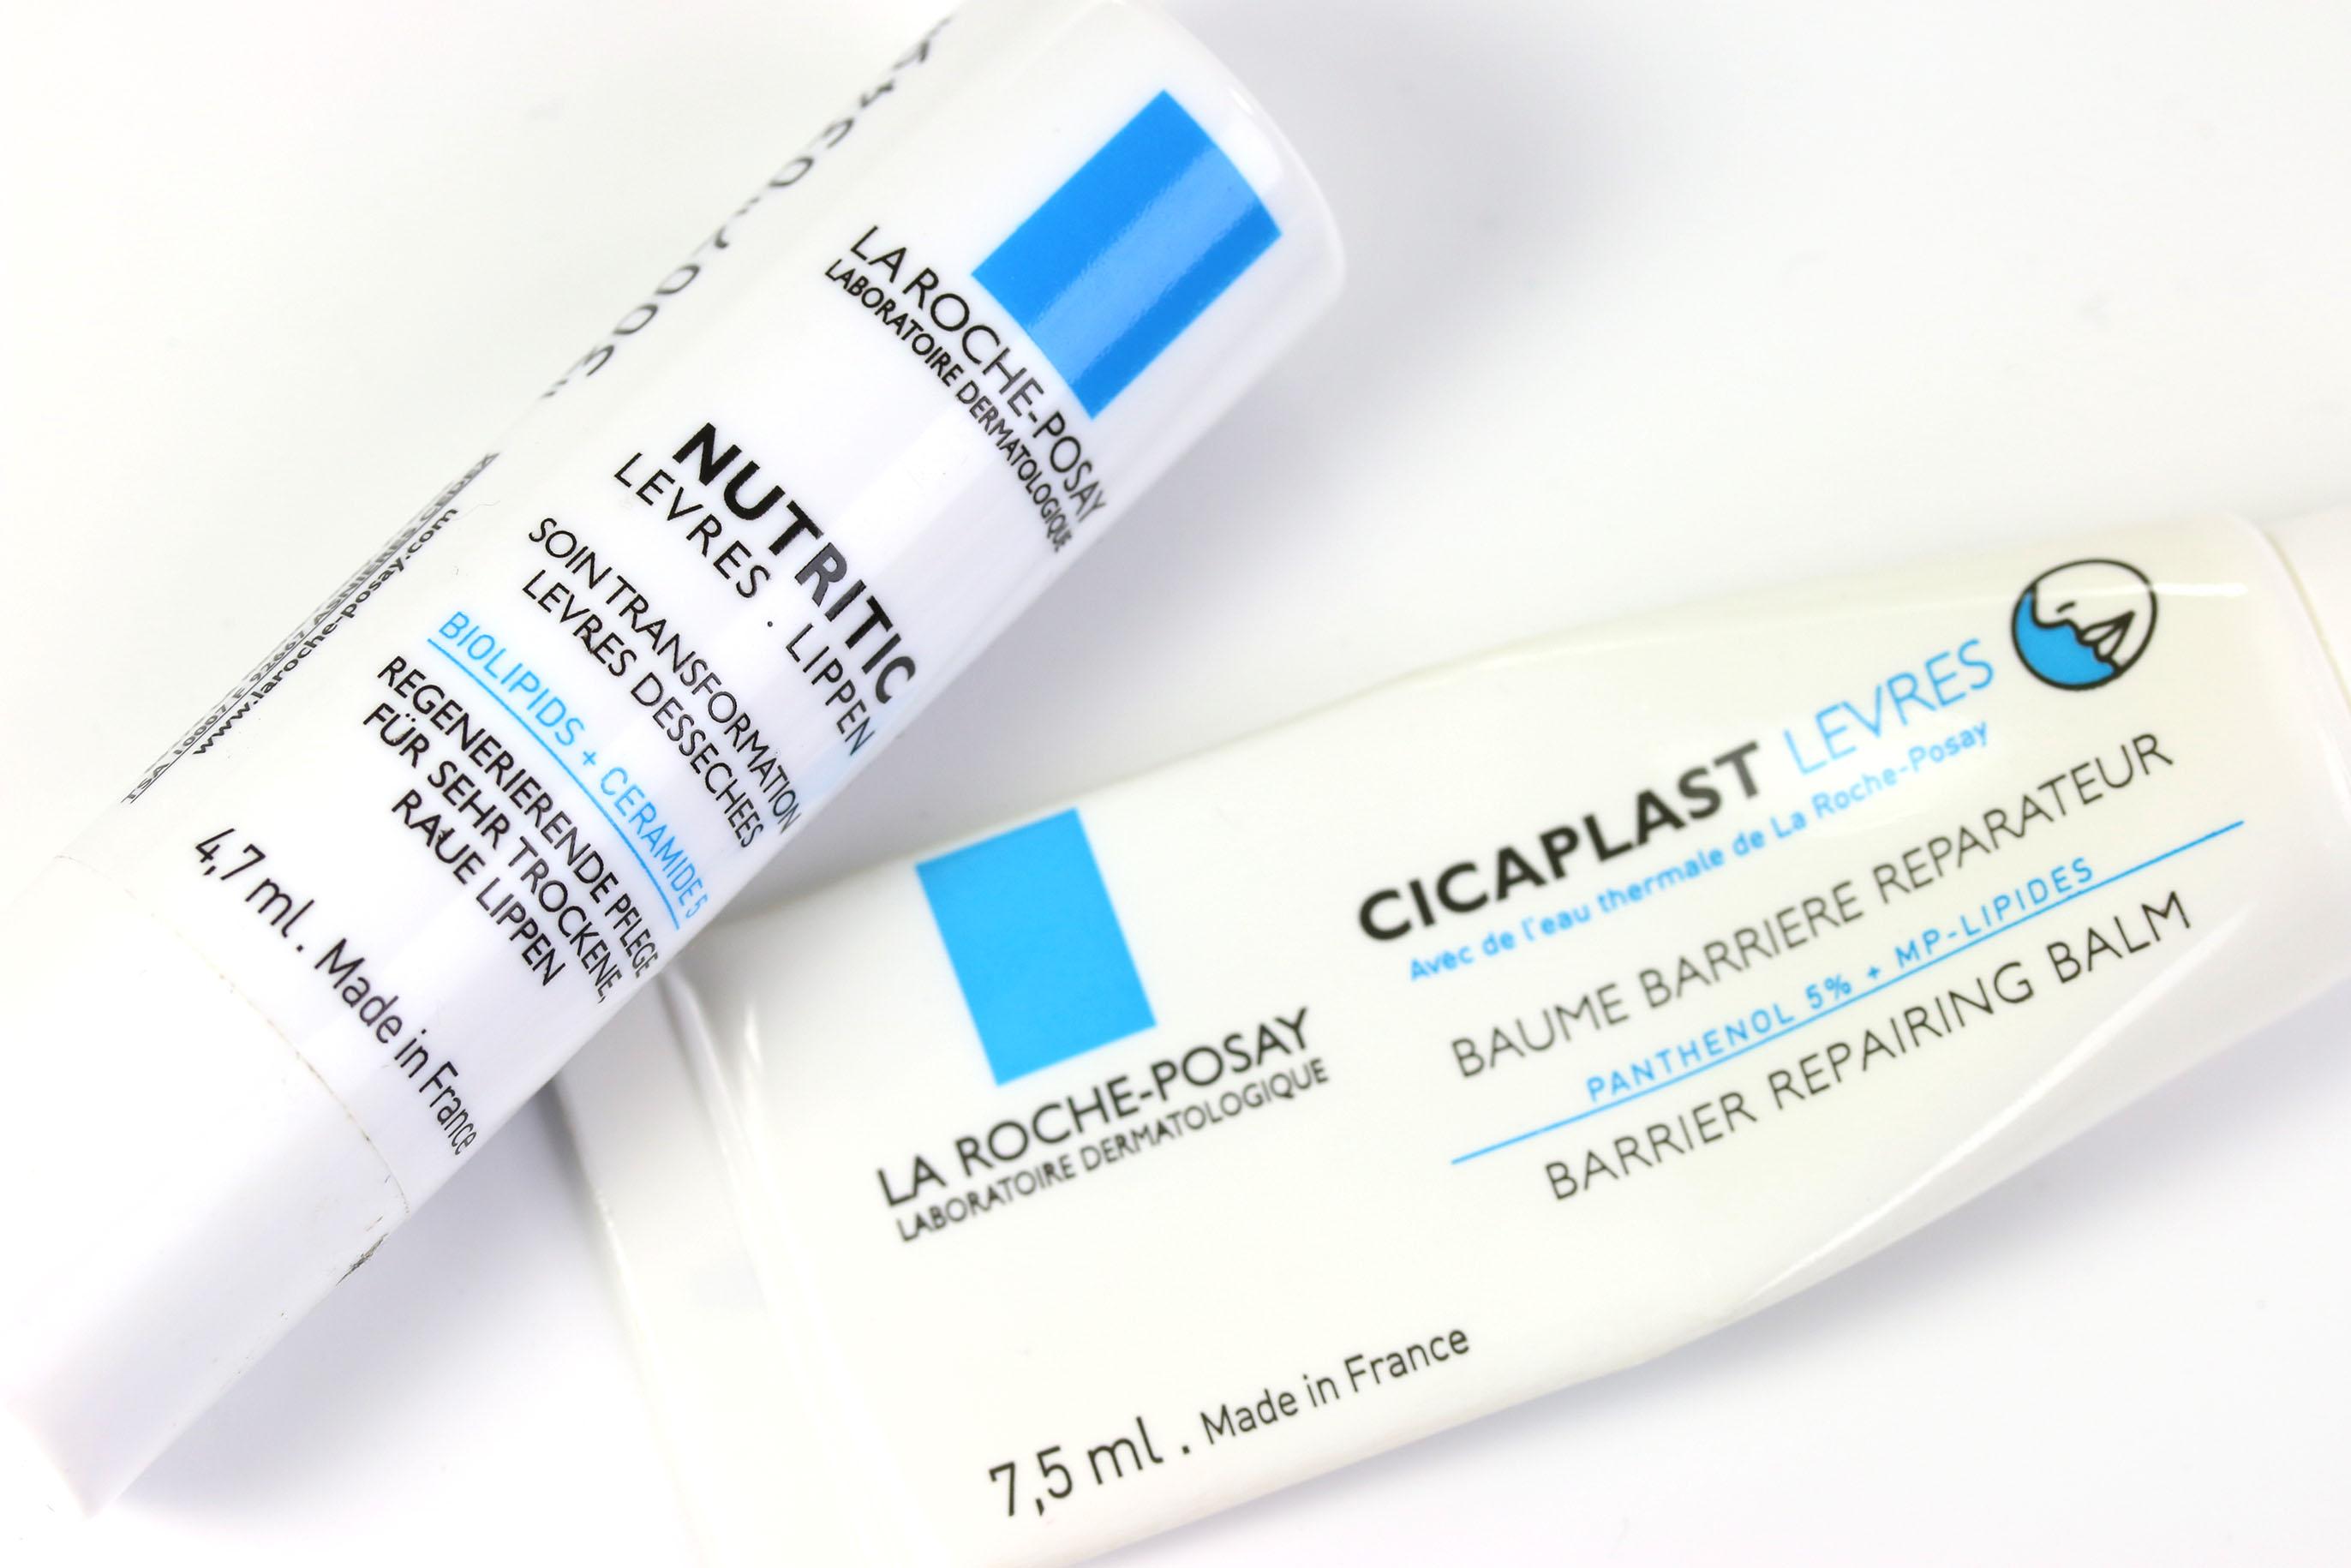 Lippenpflege La Roche-Posay